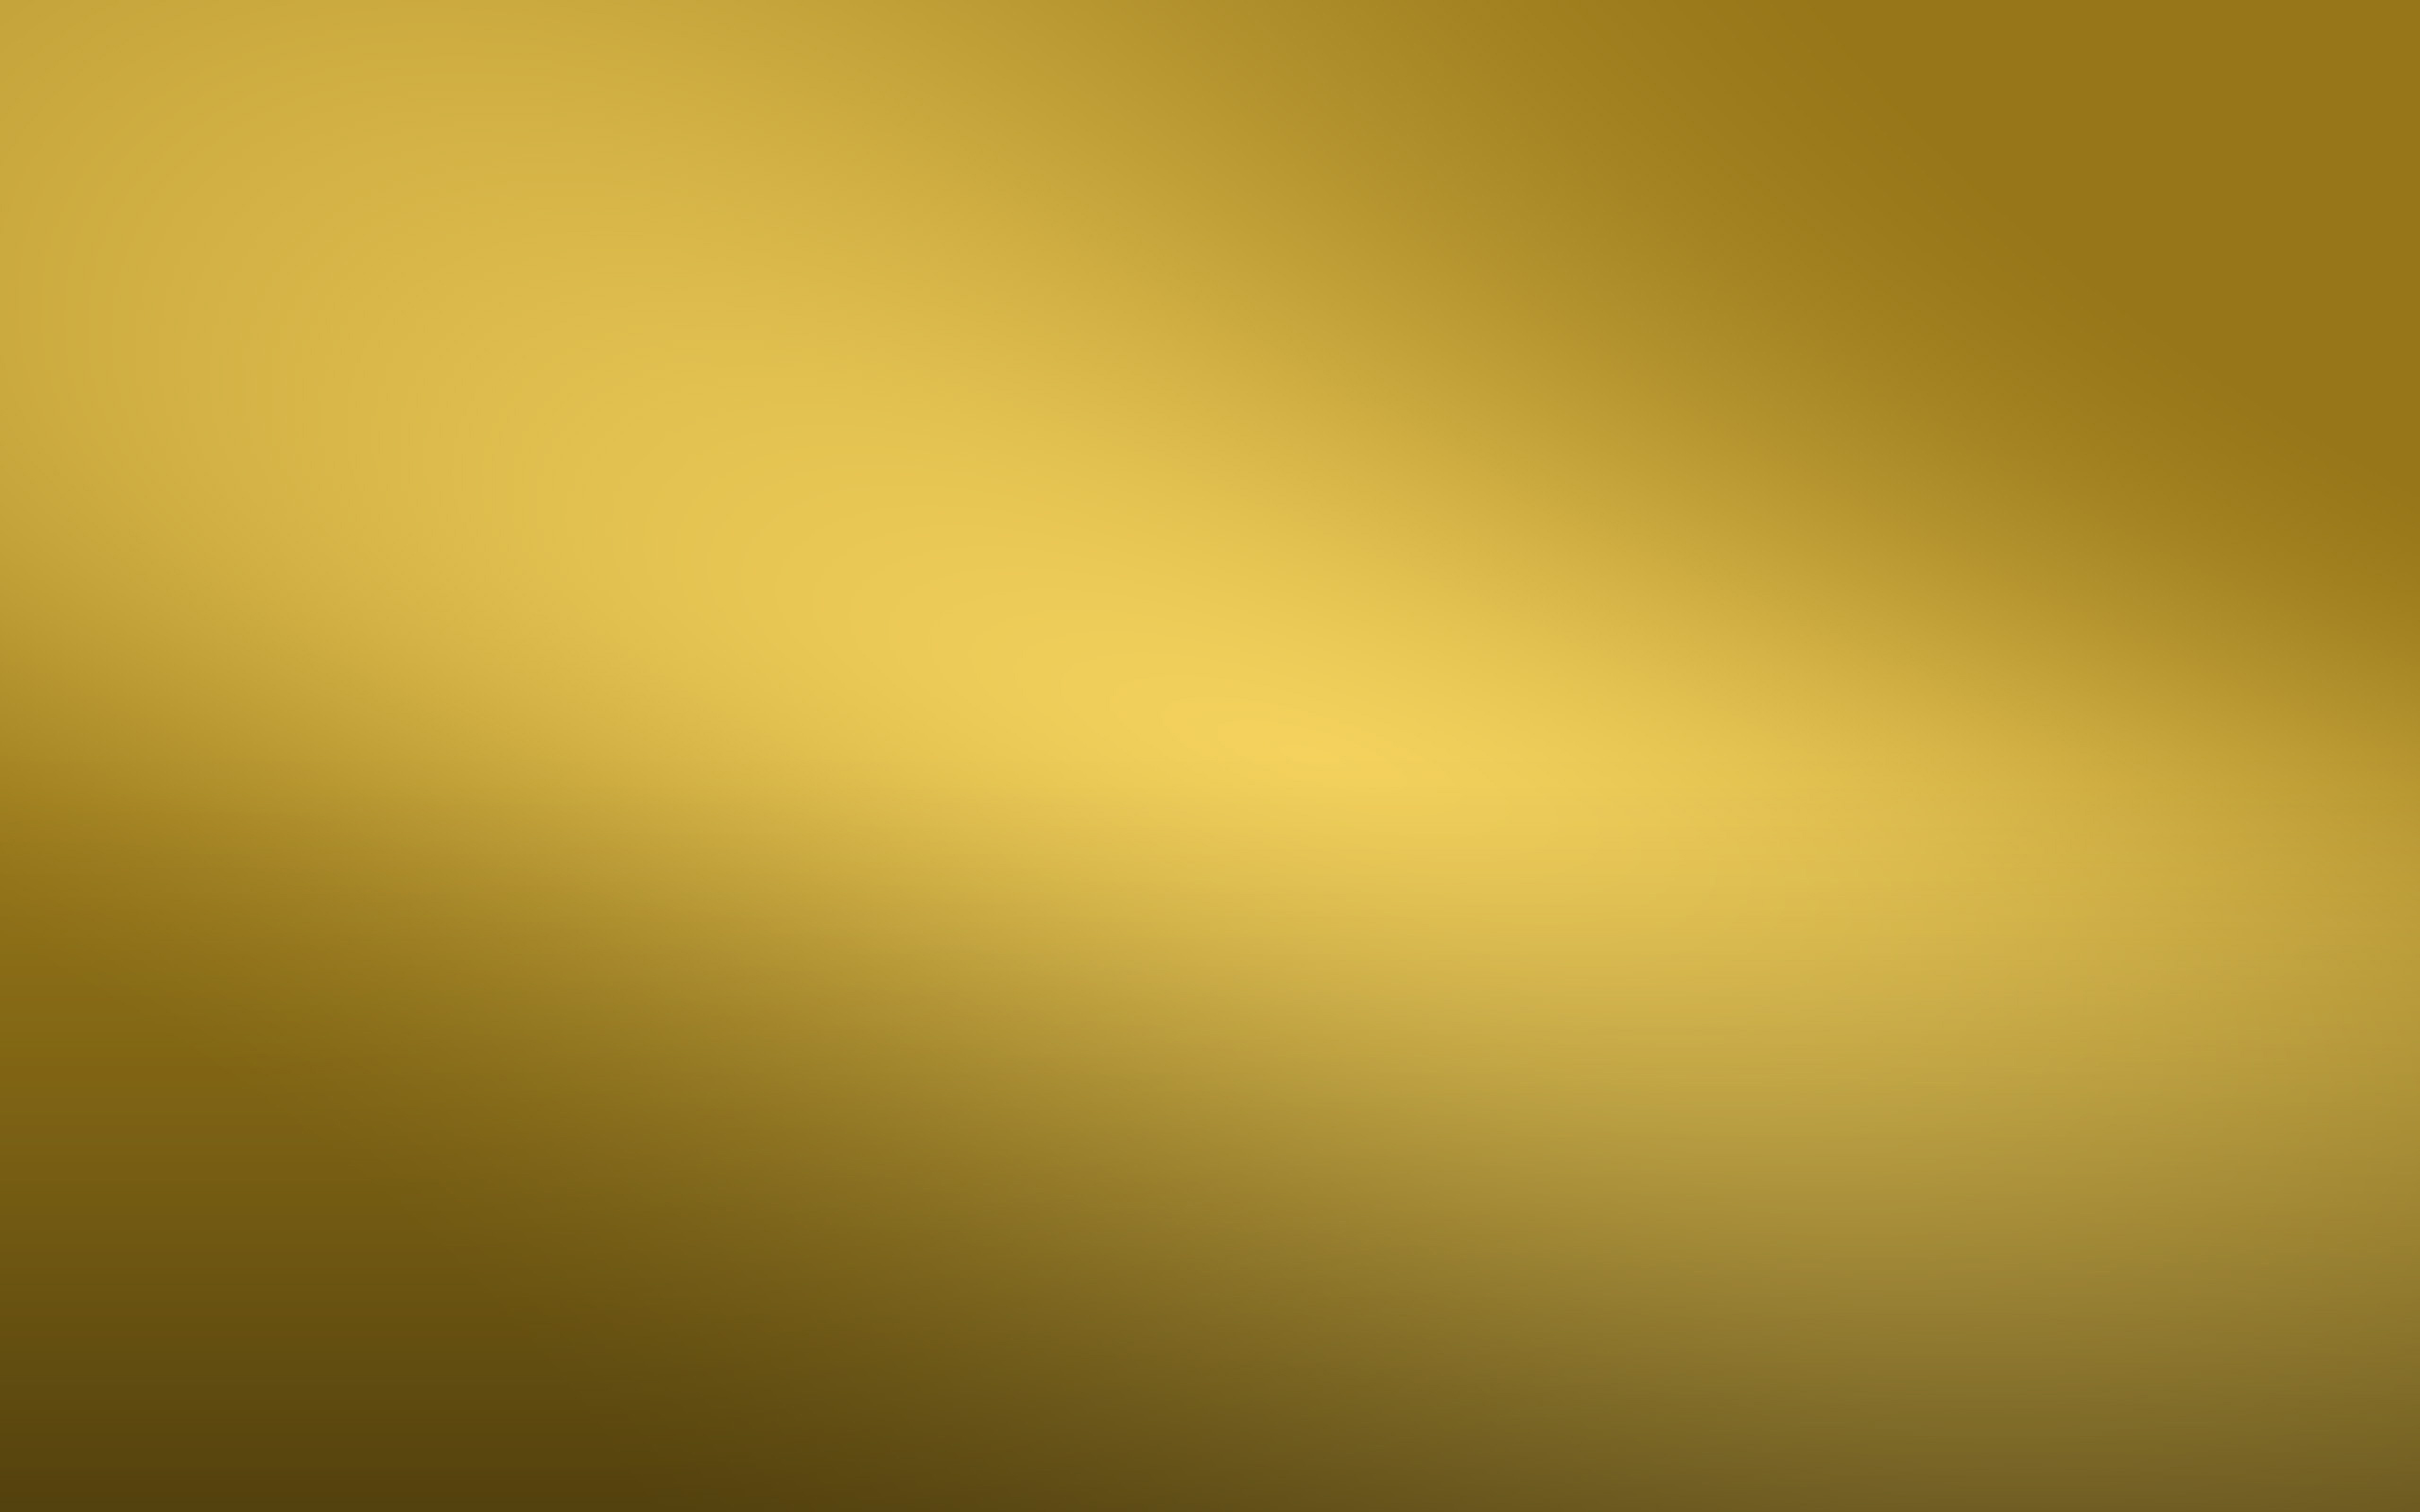 gold gradient wallpaper background 49494 2560x1600 px